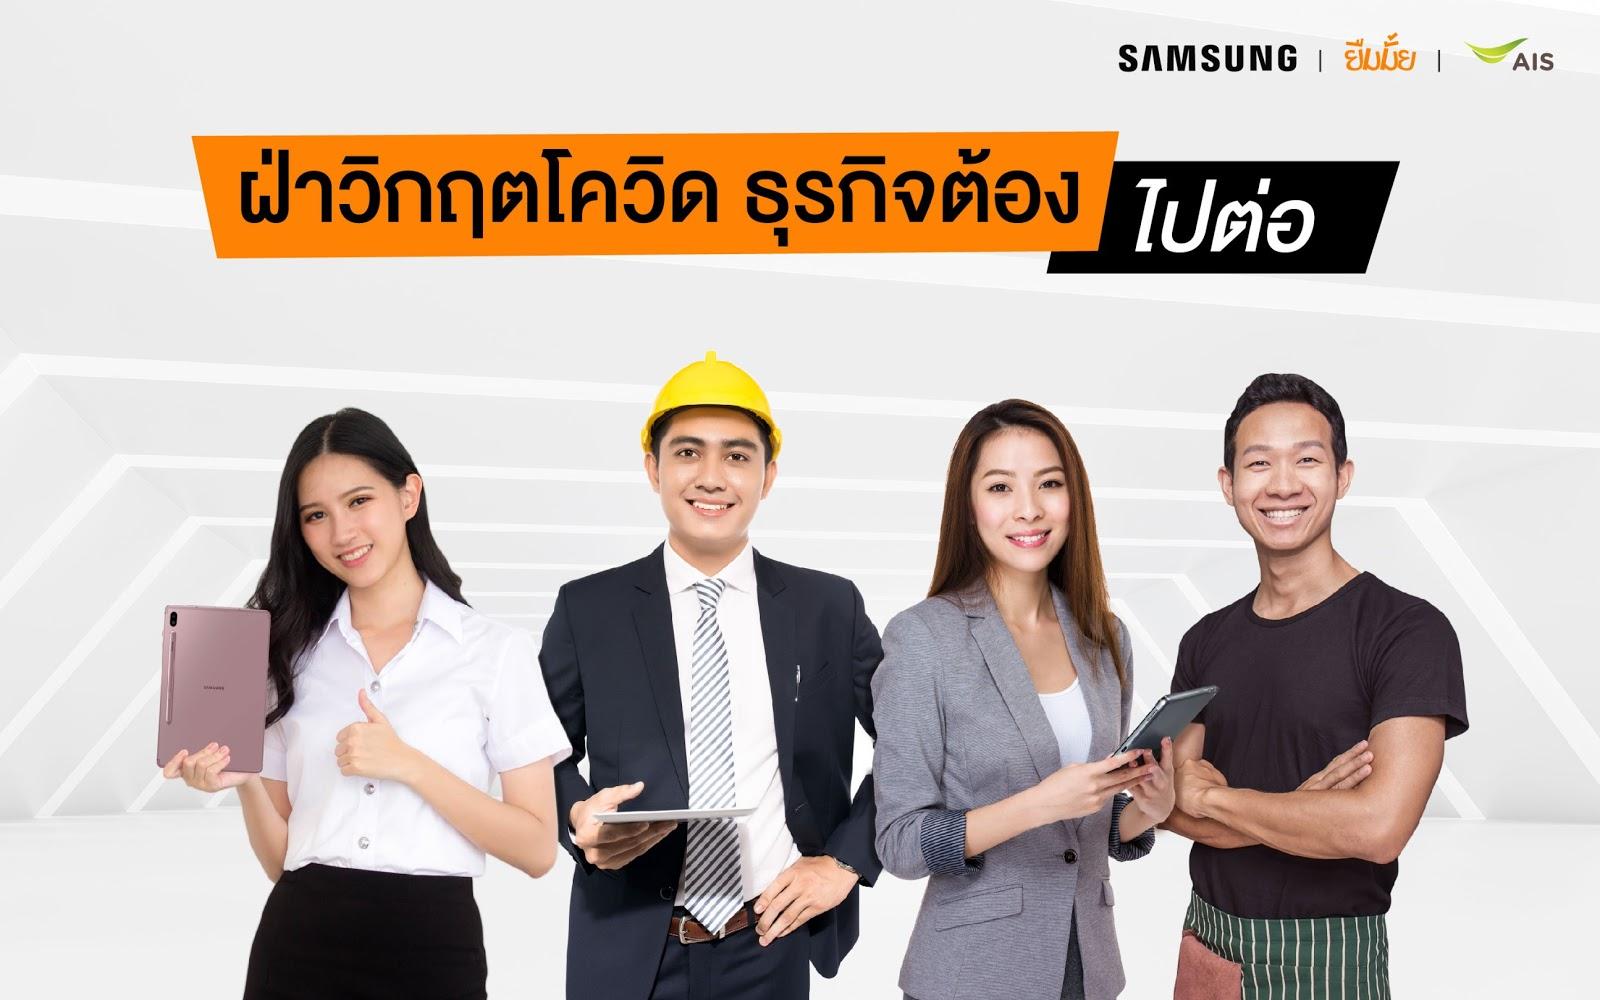 "Samsung จับมือ ยืมมั้ย เสริมศักยภาพกลุ่มธุรกิจและองค์กร  ให้ ""ยืม"" สมาร์ทดีไวซ์เพื่อตอบโจทย์ไลฟ์สไตล์การทำงานให้คุ้มค่ากว่าเดิม"